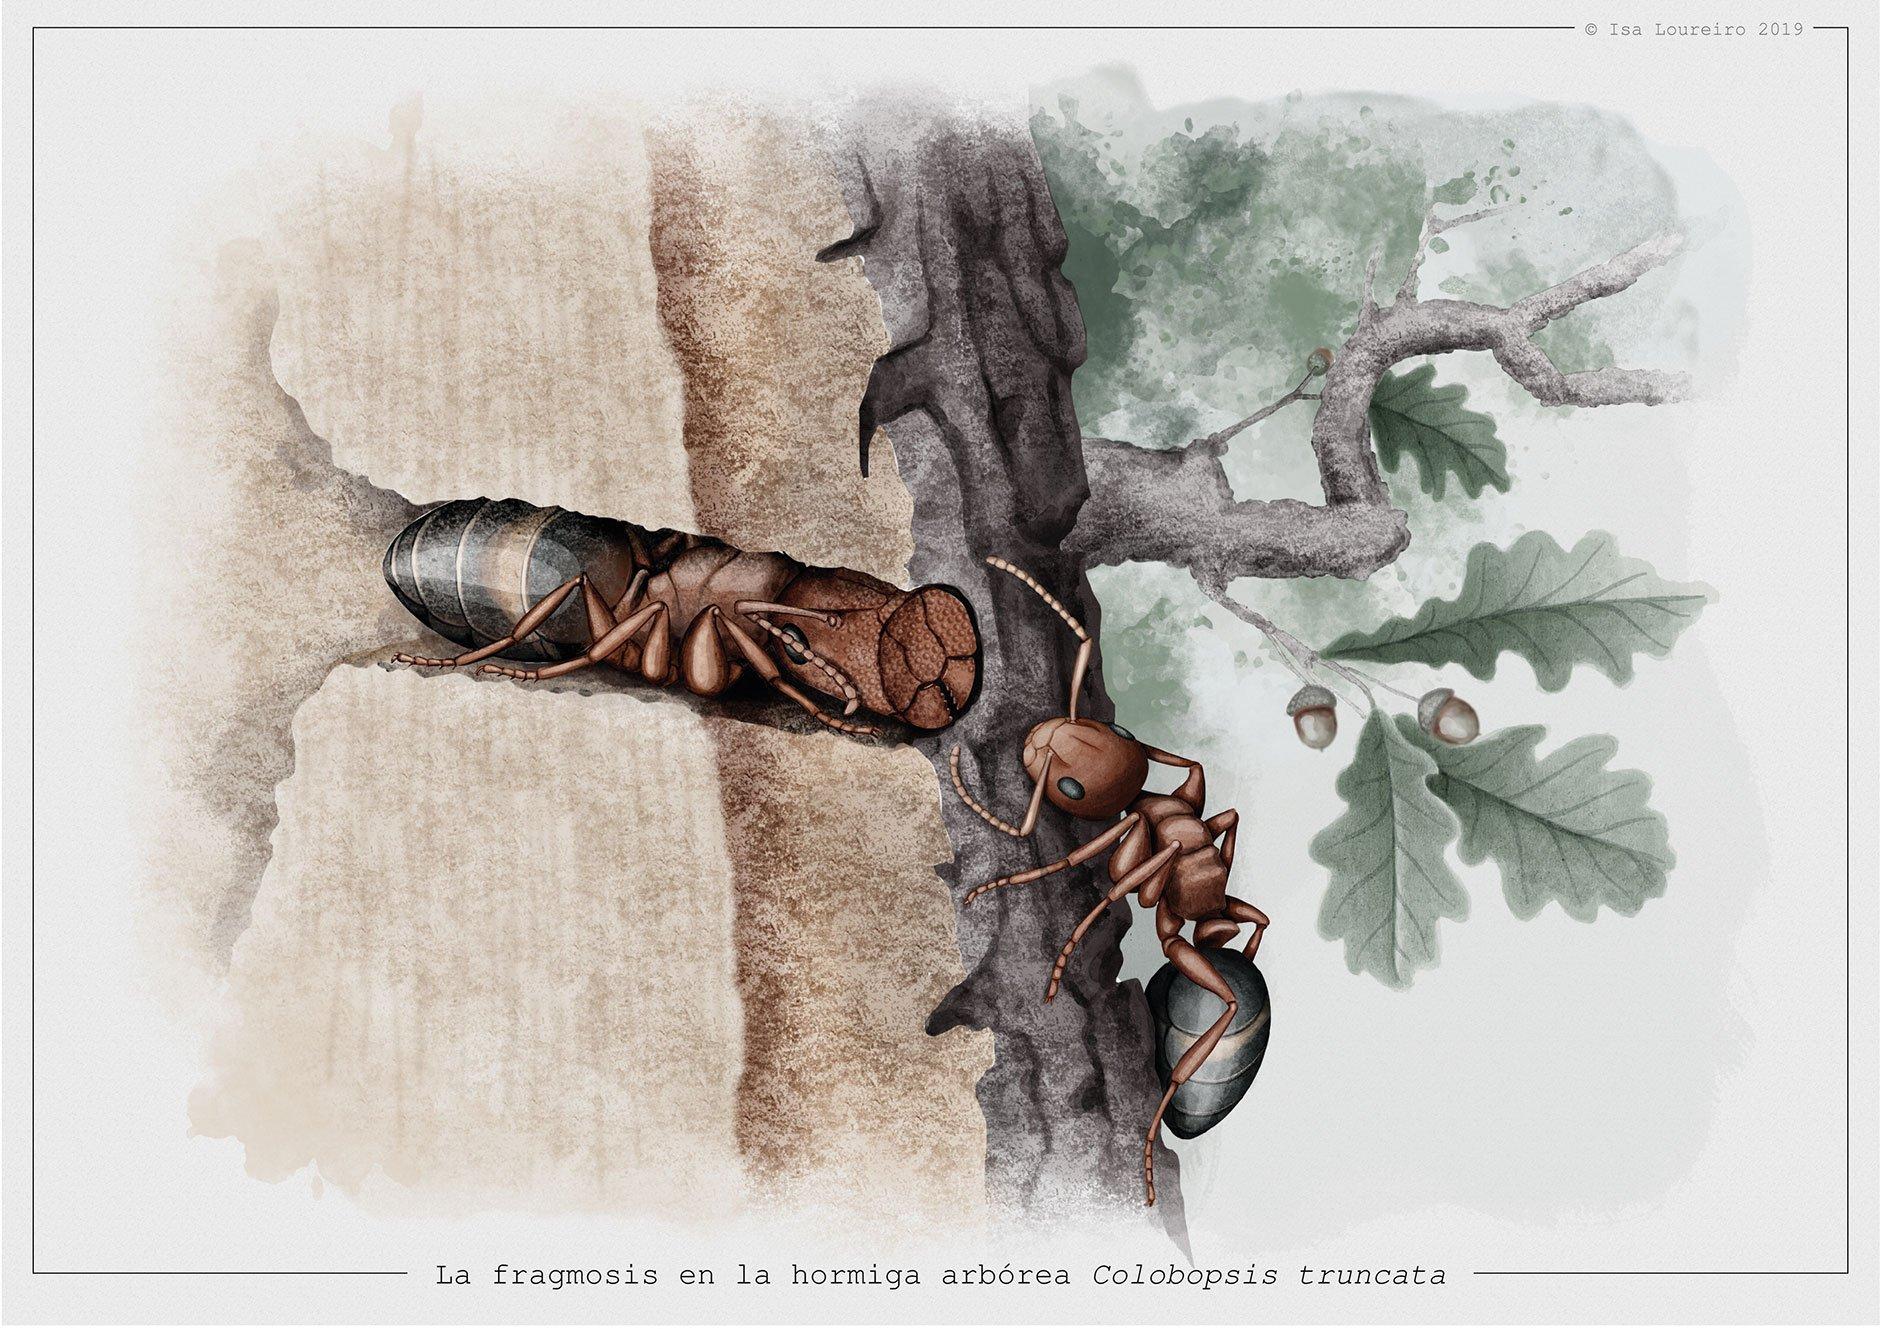 Fragmosis_Colobopsis_truncata_isaloureiro